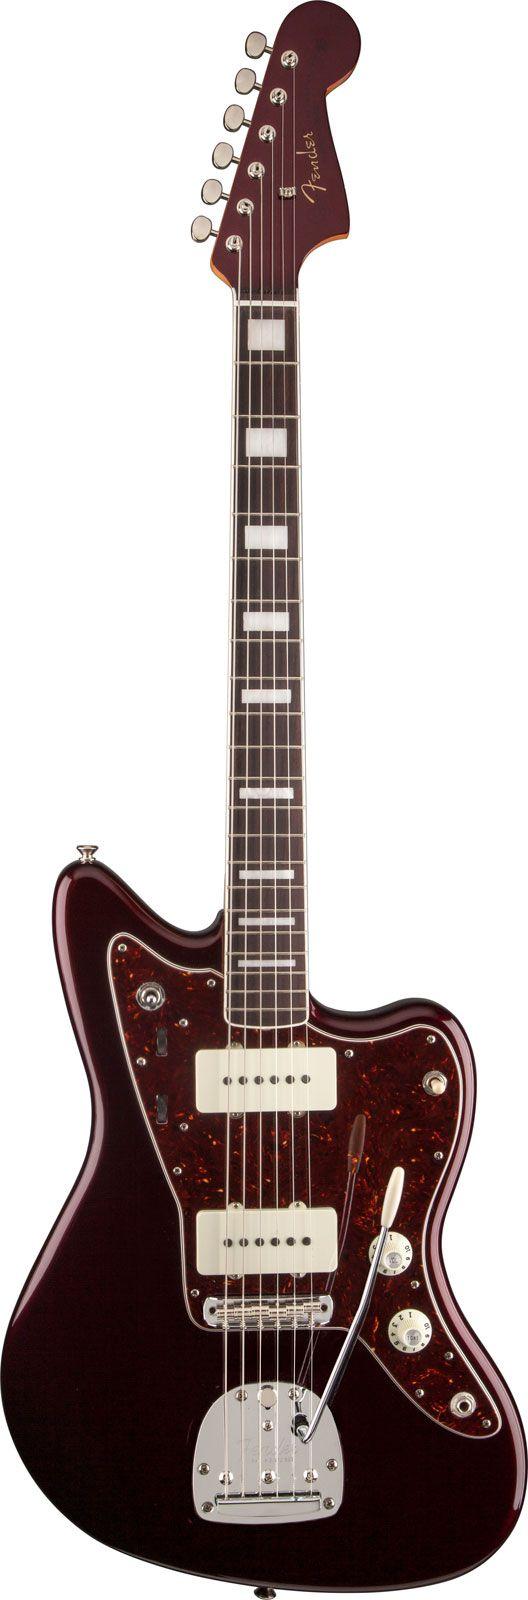 Fender Troy Van Leeuwen Jazzmaster RW Oxblood